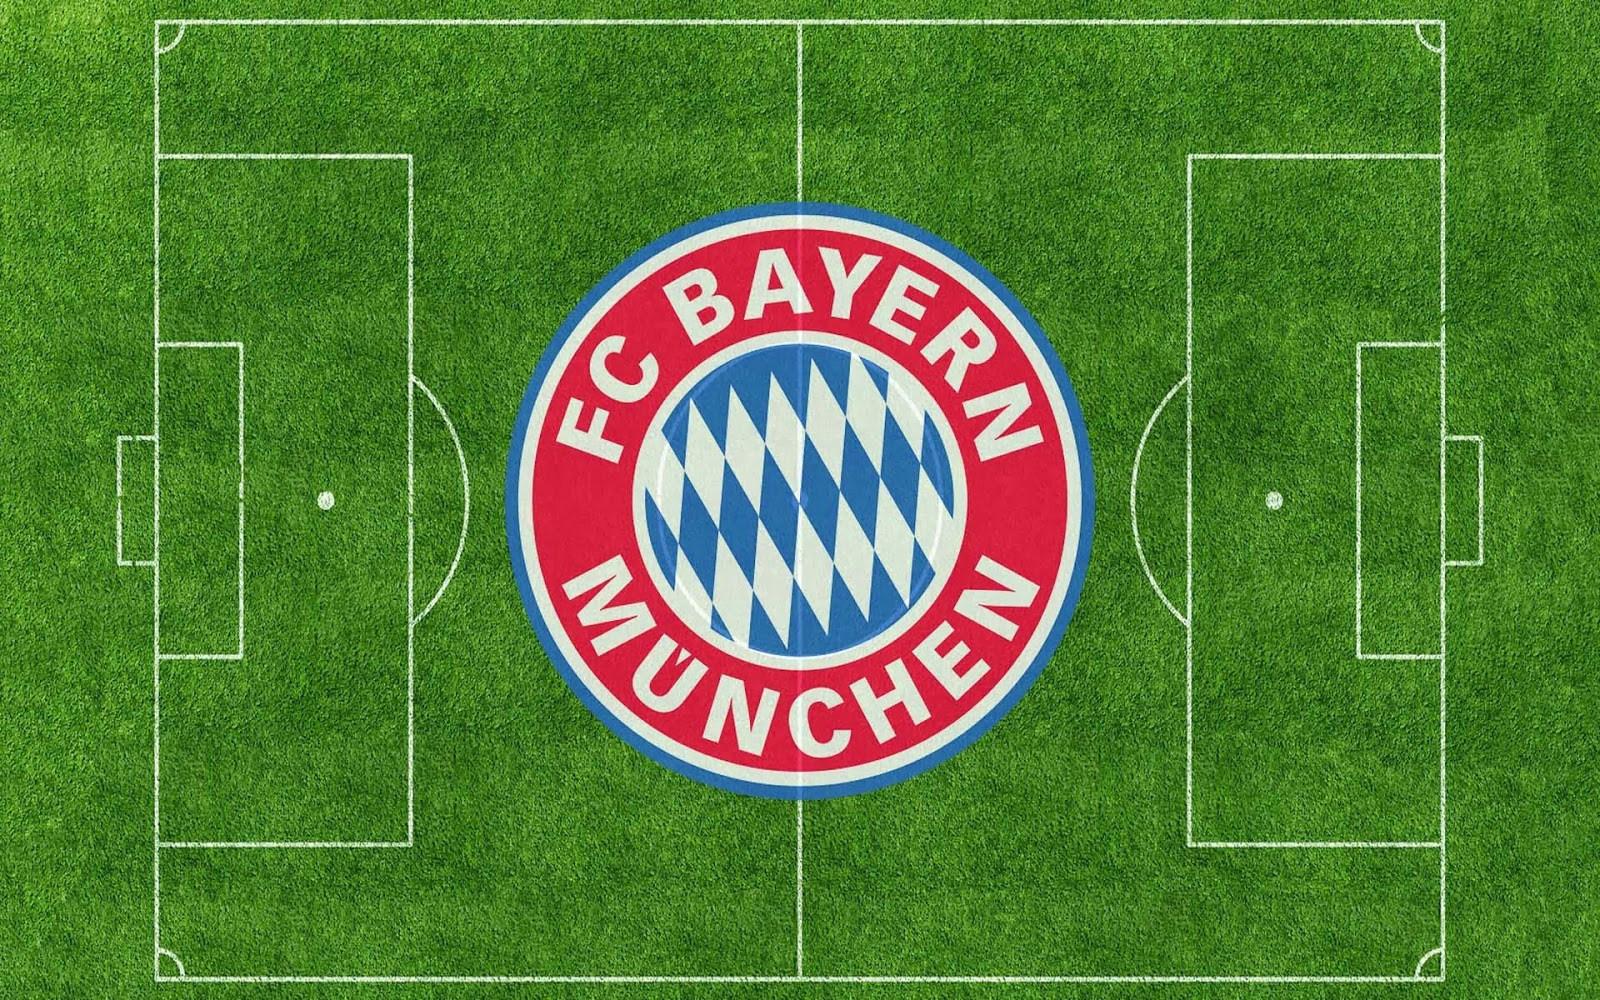 Bundesliga Wappen Zum Ausmalen Genial Ausmalbilder Bundesliga Wappen Elegant 40 Ausmalbilder Fc Bayern Das Bild